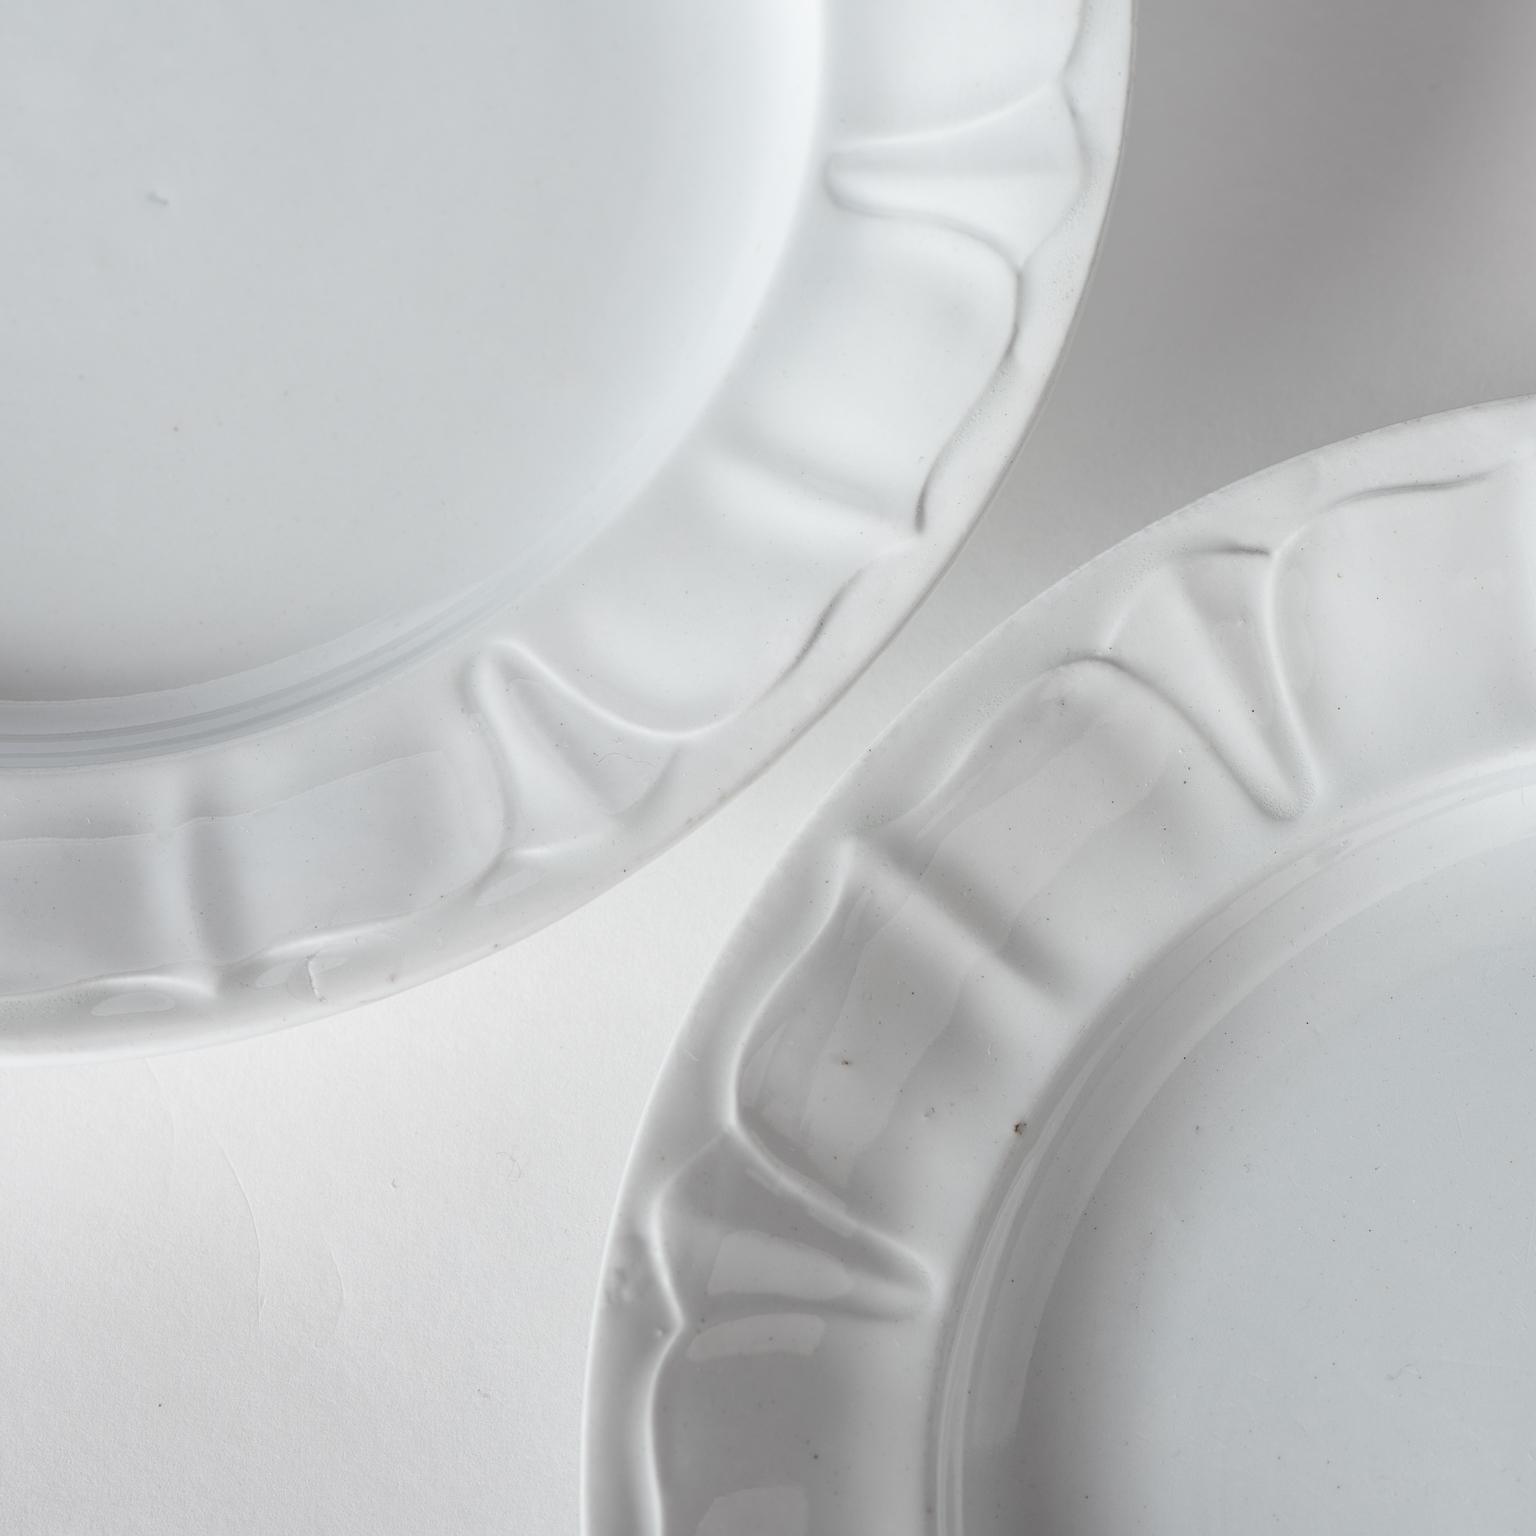 & Six White Ironstone Dinner Plates Sydenham Pattern England